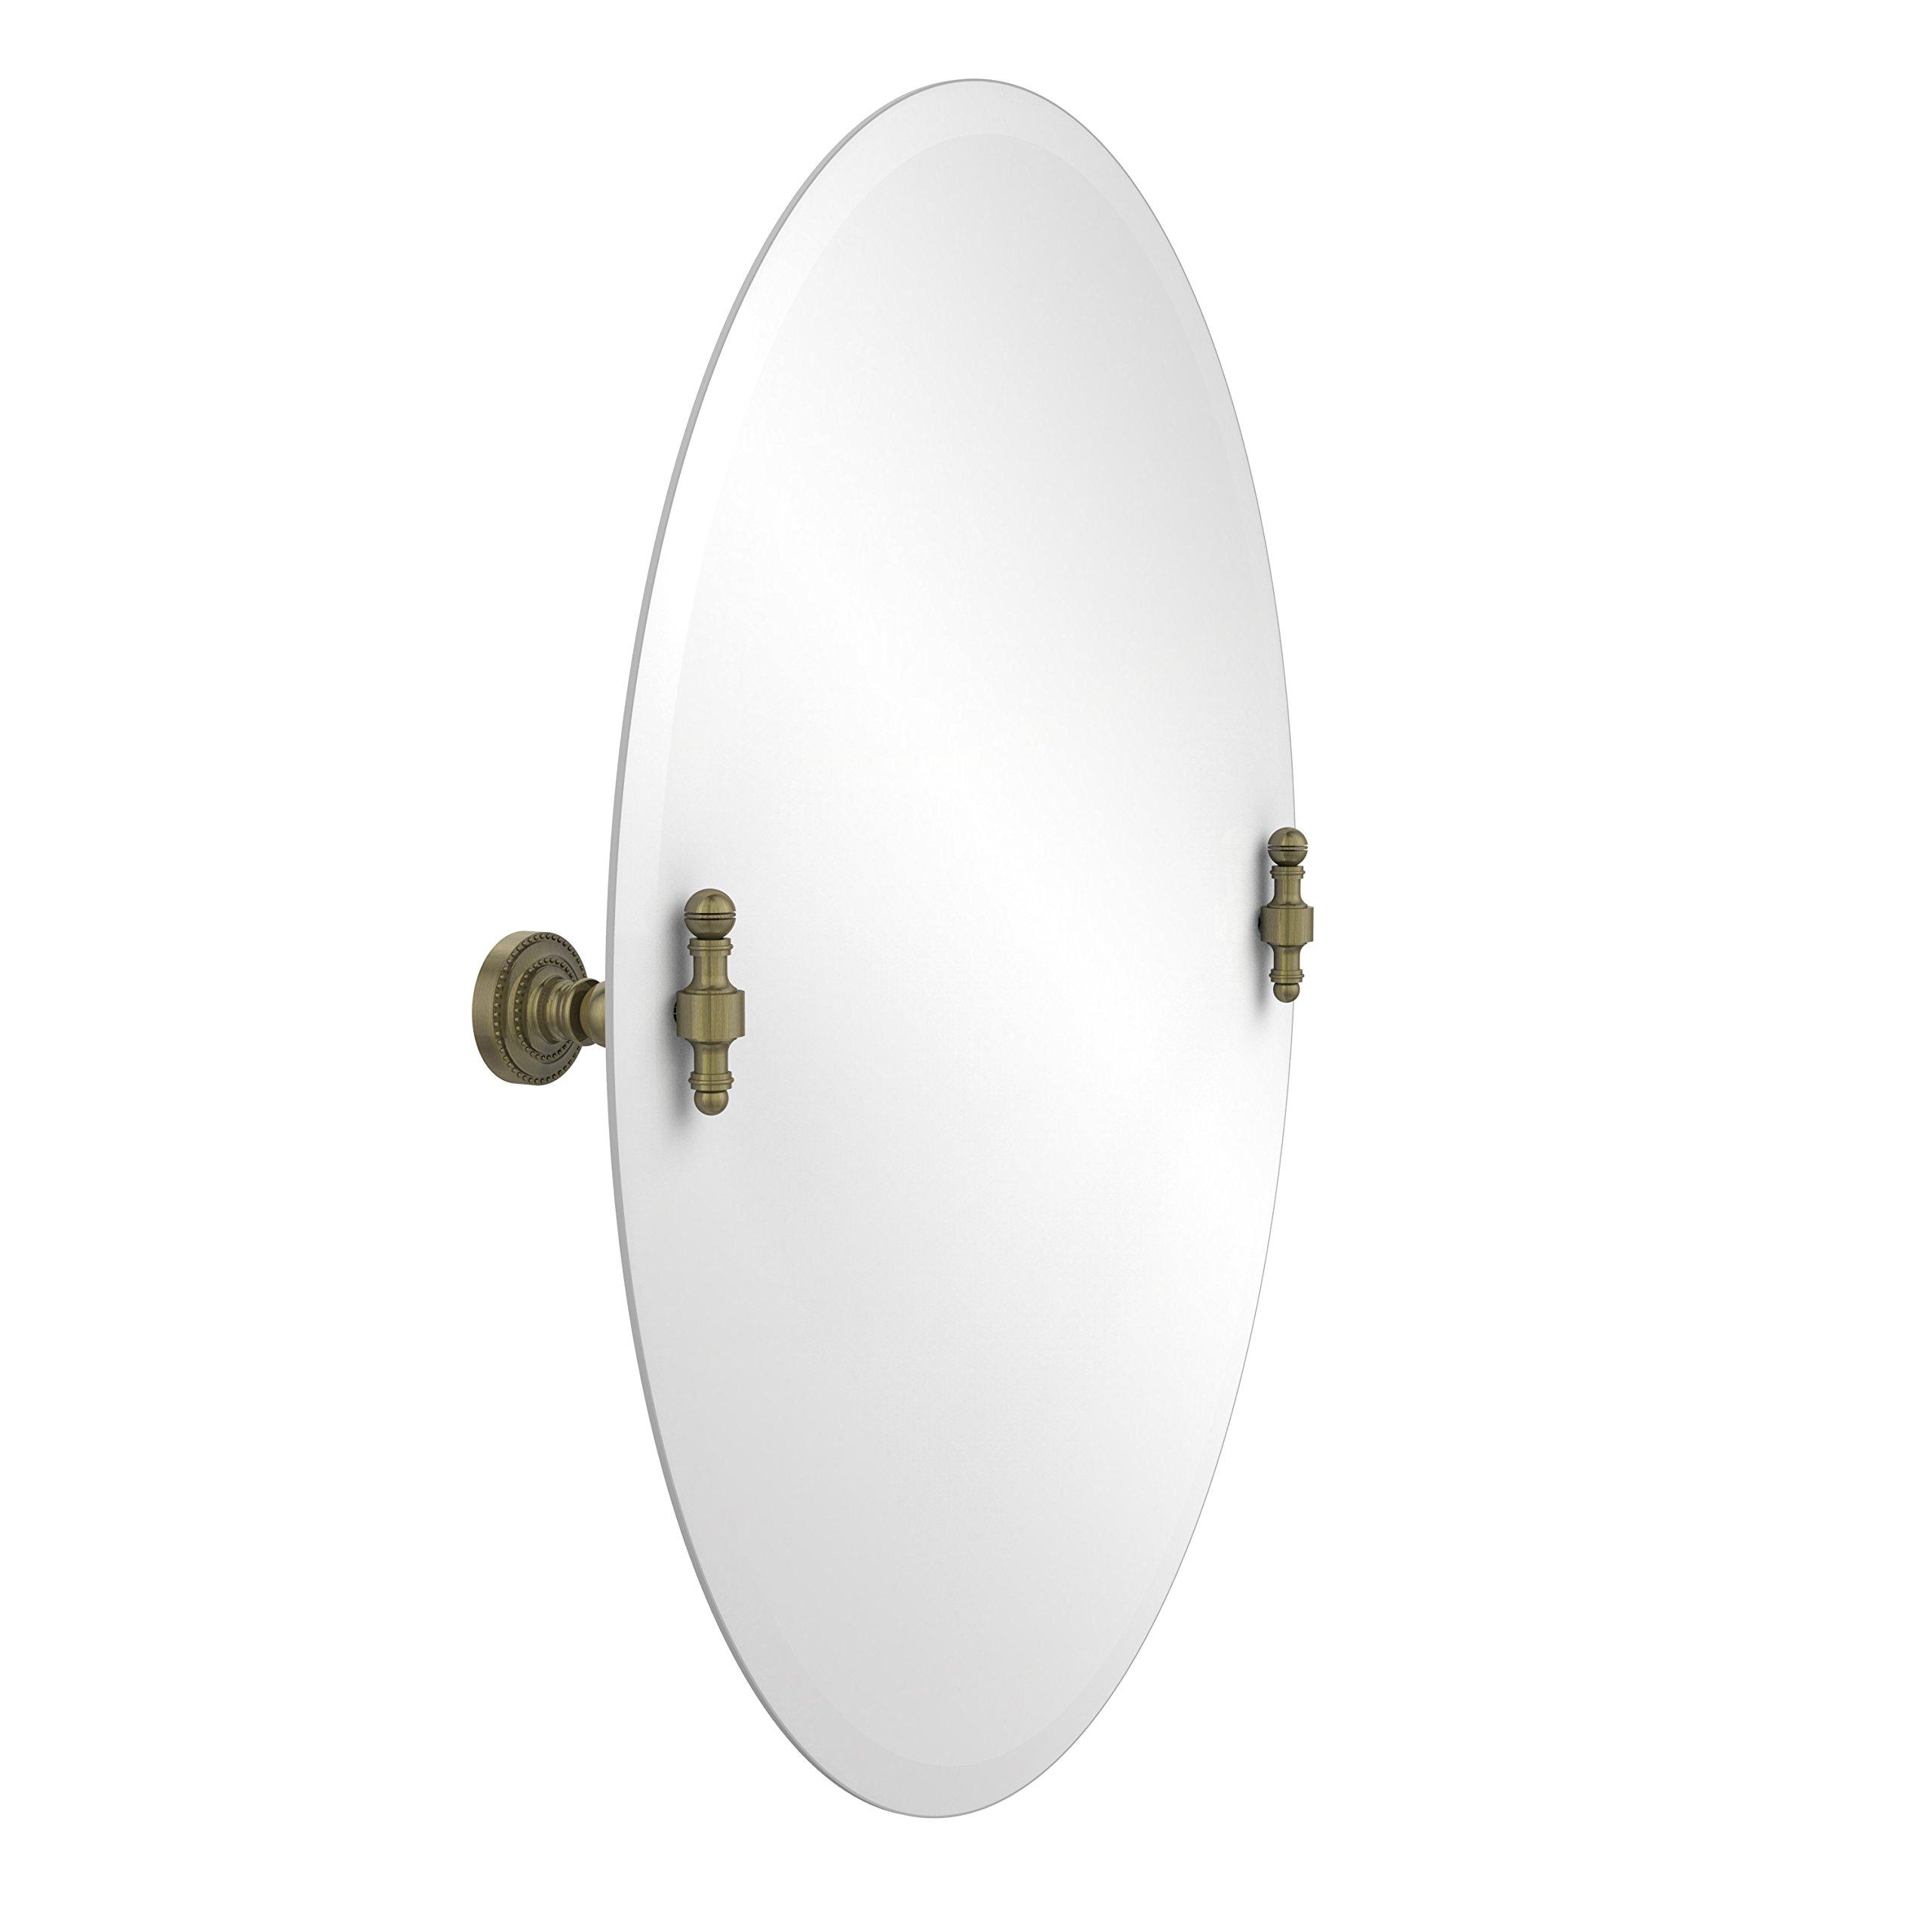 Allied Brass RD-91-ABR  21-Inchx29-Inch Oval Tilt Mirror, Antique Brass